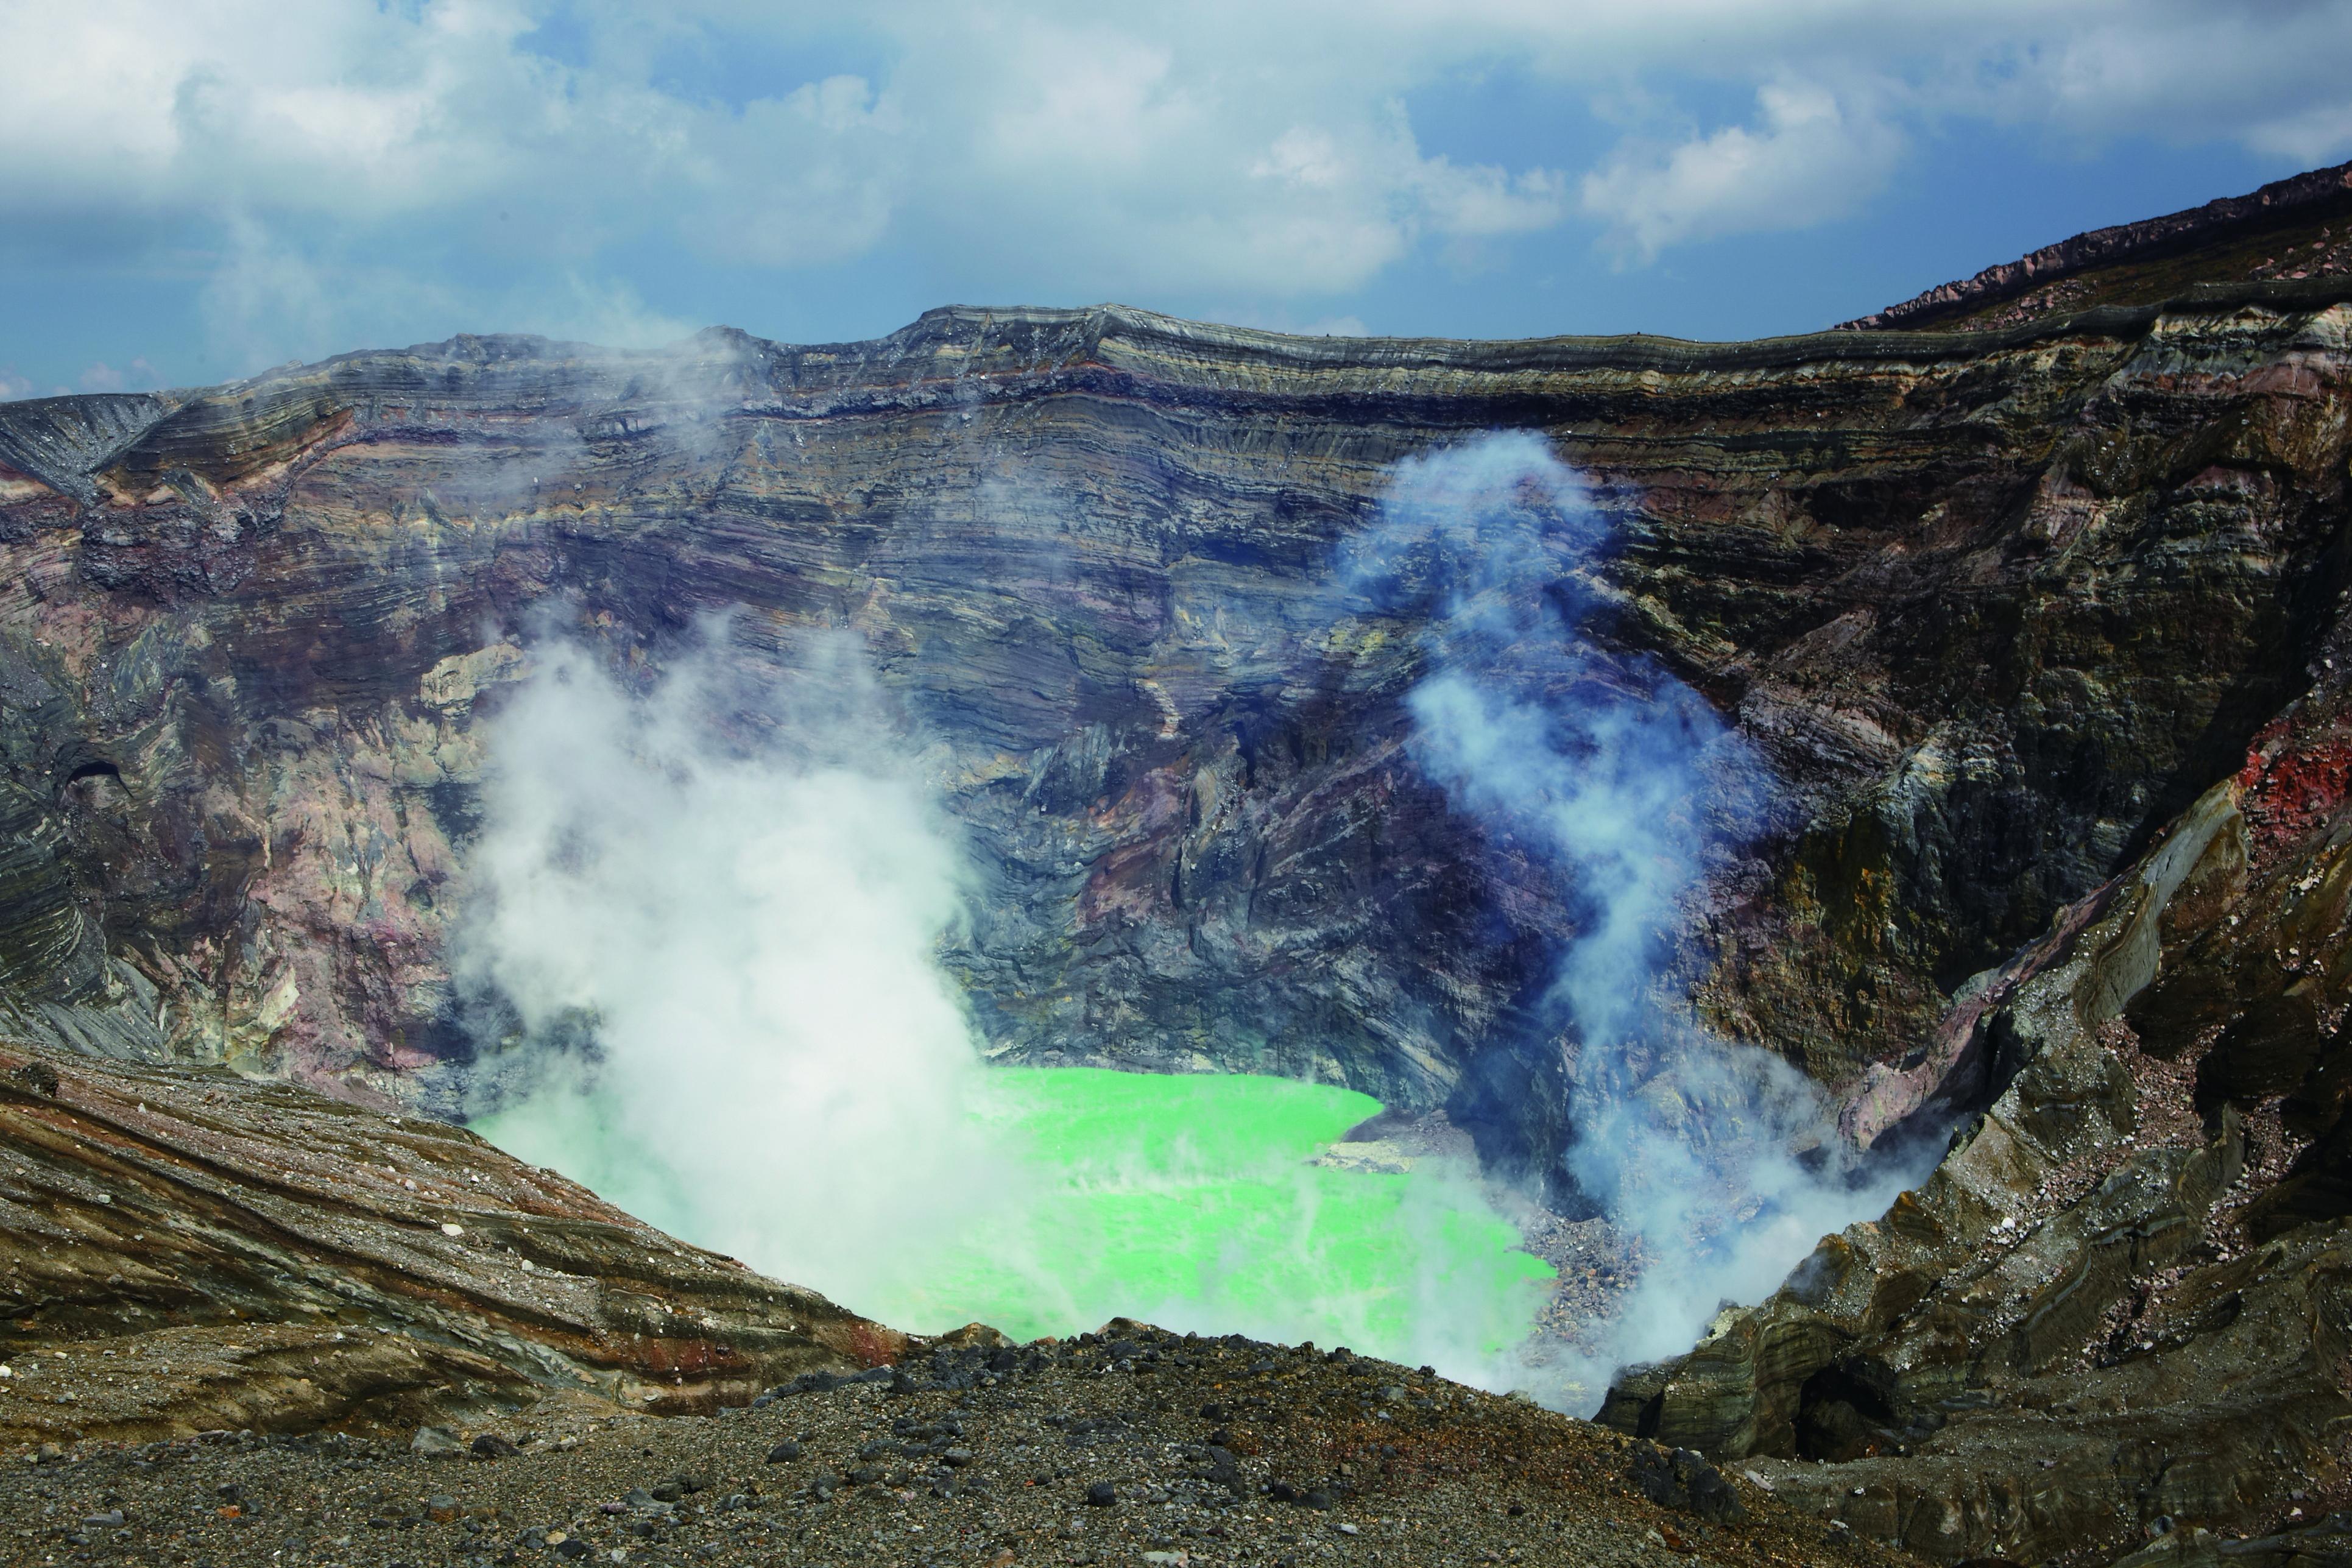 Mt. Aso Nakadake Crater